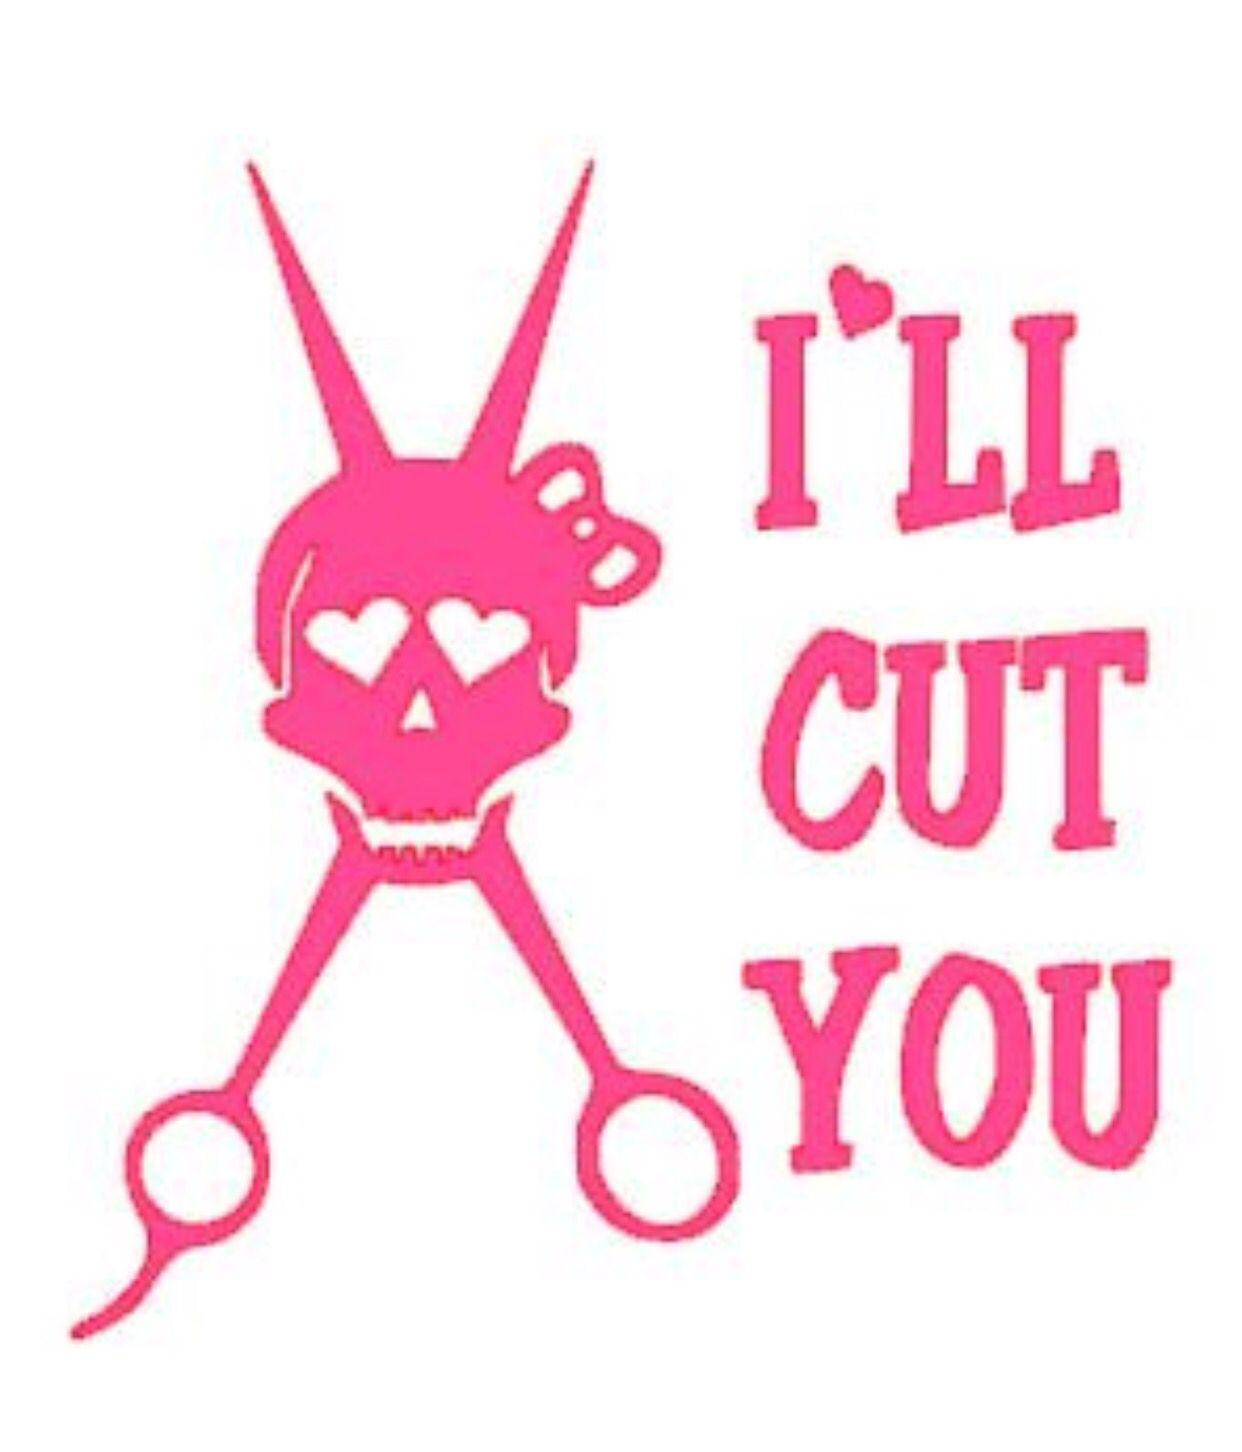 Hair Stylist Cosmetologist Ill Cut You Skull Scissors Car Decal - Hair stylist custom vinyl decals for car